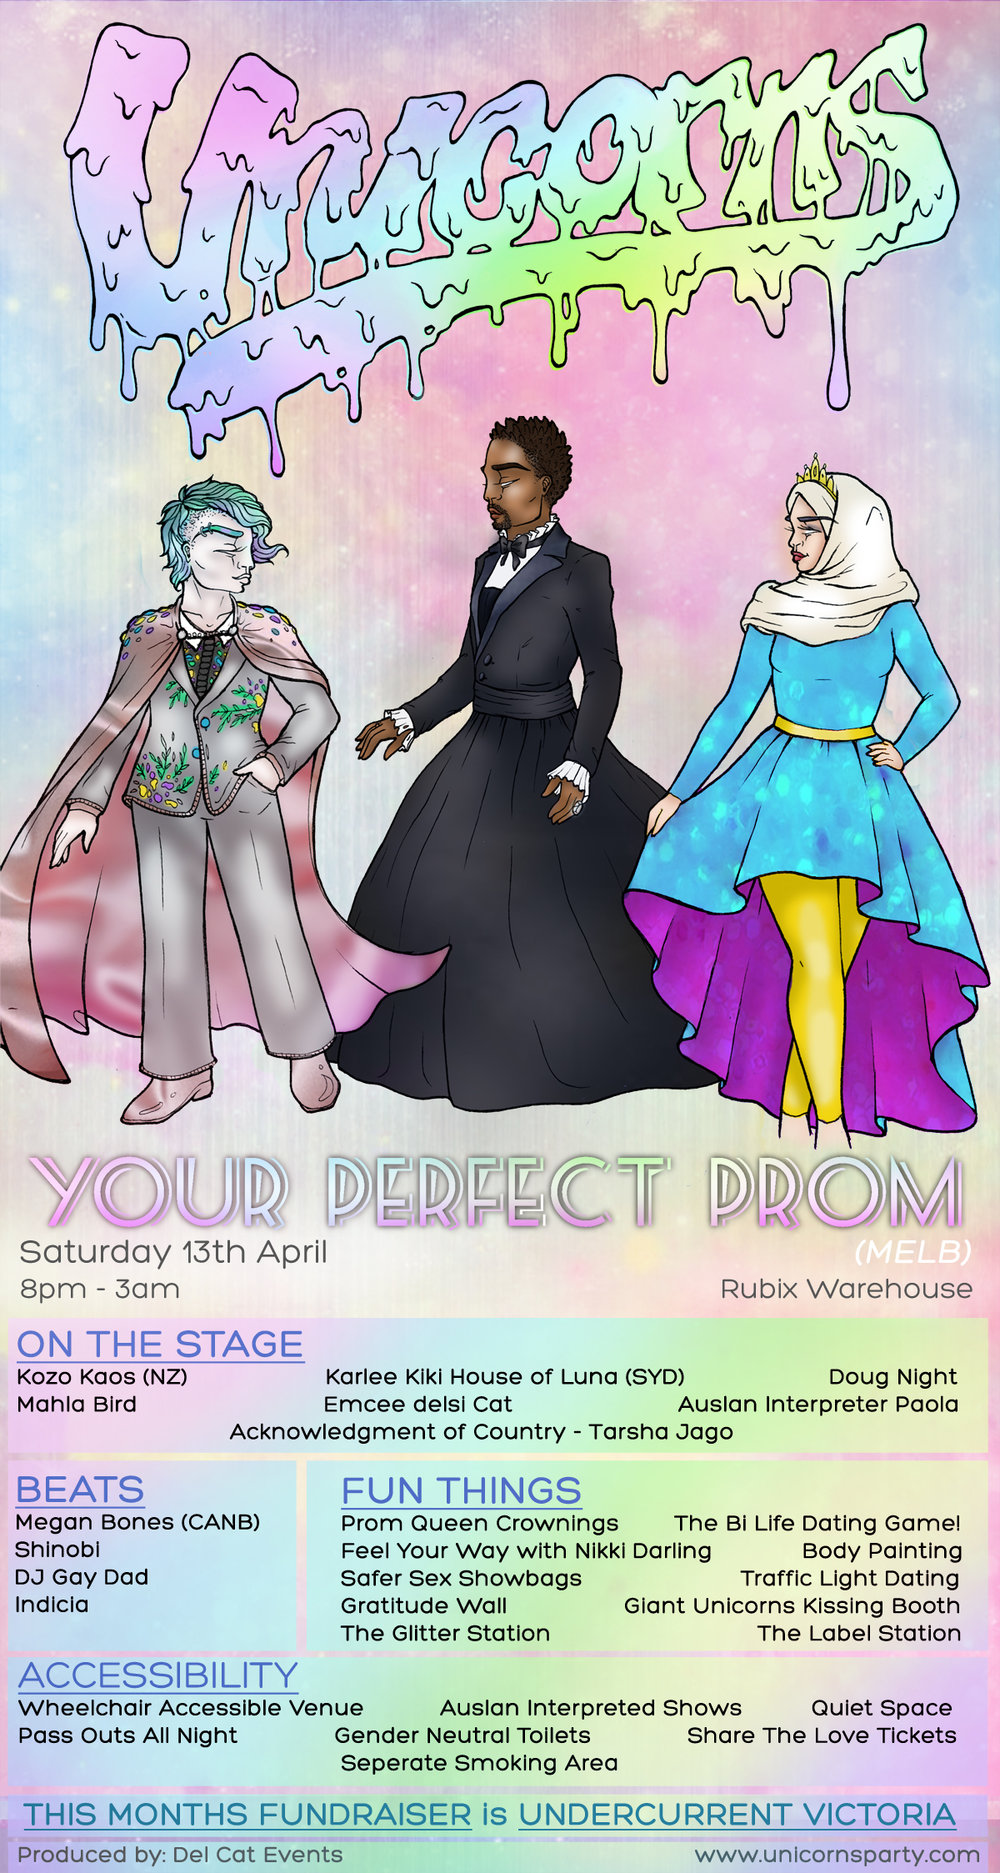 Unicorns - Your Perfect Prom (MELB) - Sat 13 April8pm - 3amRubix WarehouseTIX HERE